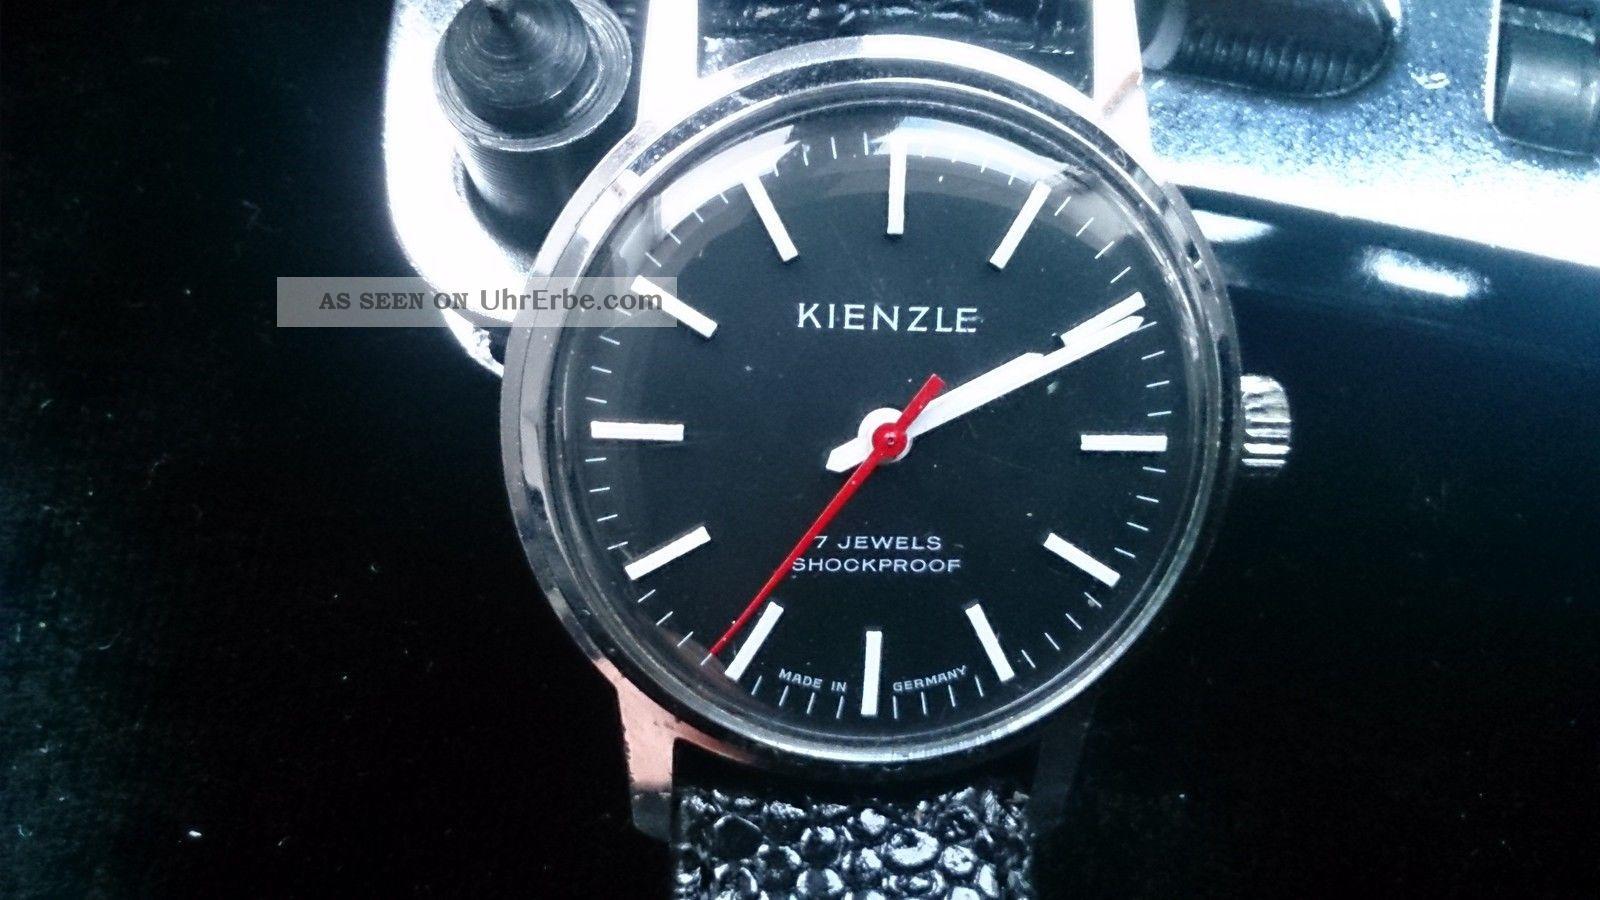 Alte Kienzle Armbanduhr In Bahnhofsuhr - Optik Armbanduhren Bild